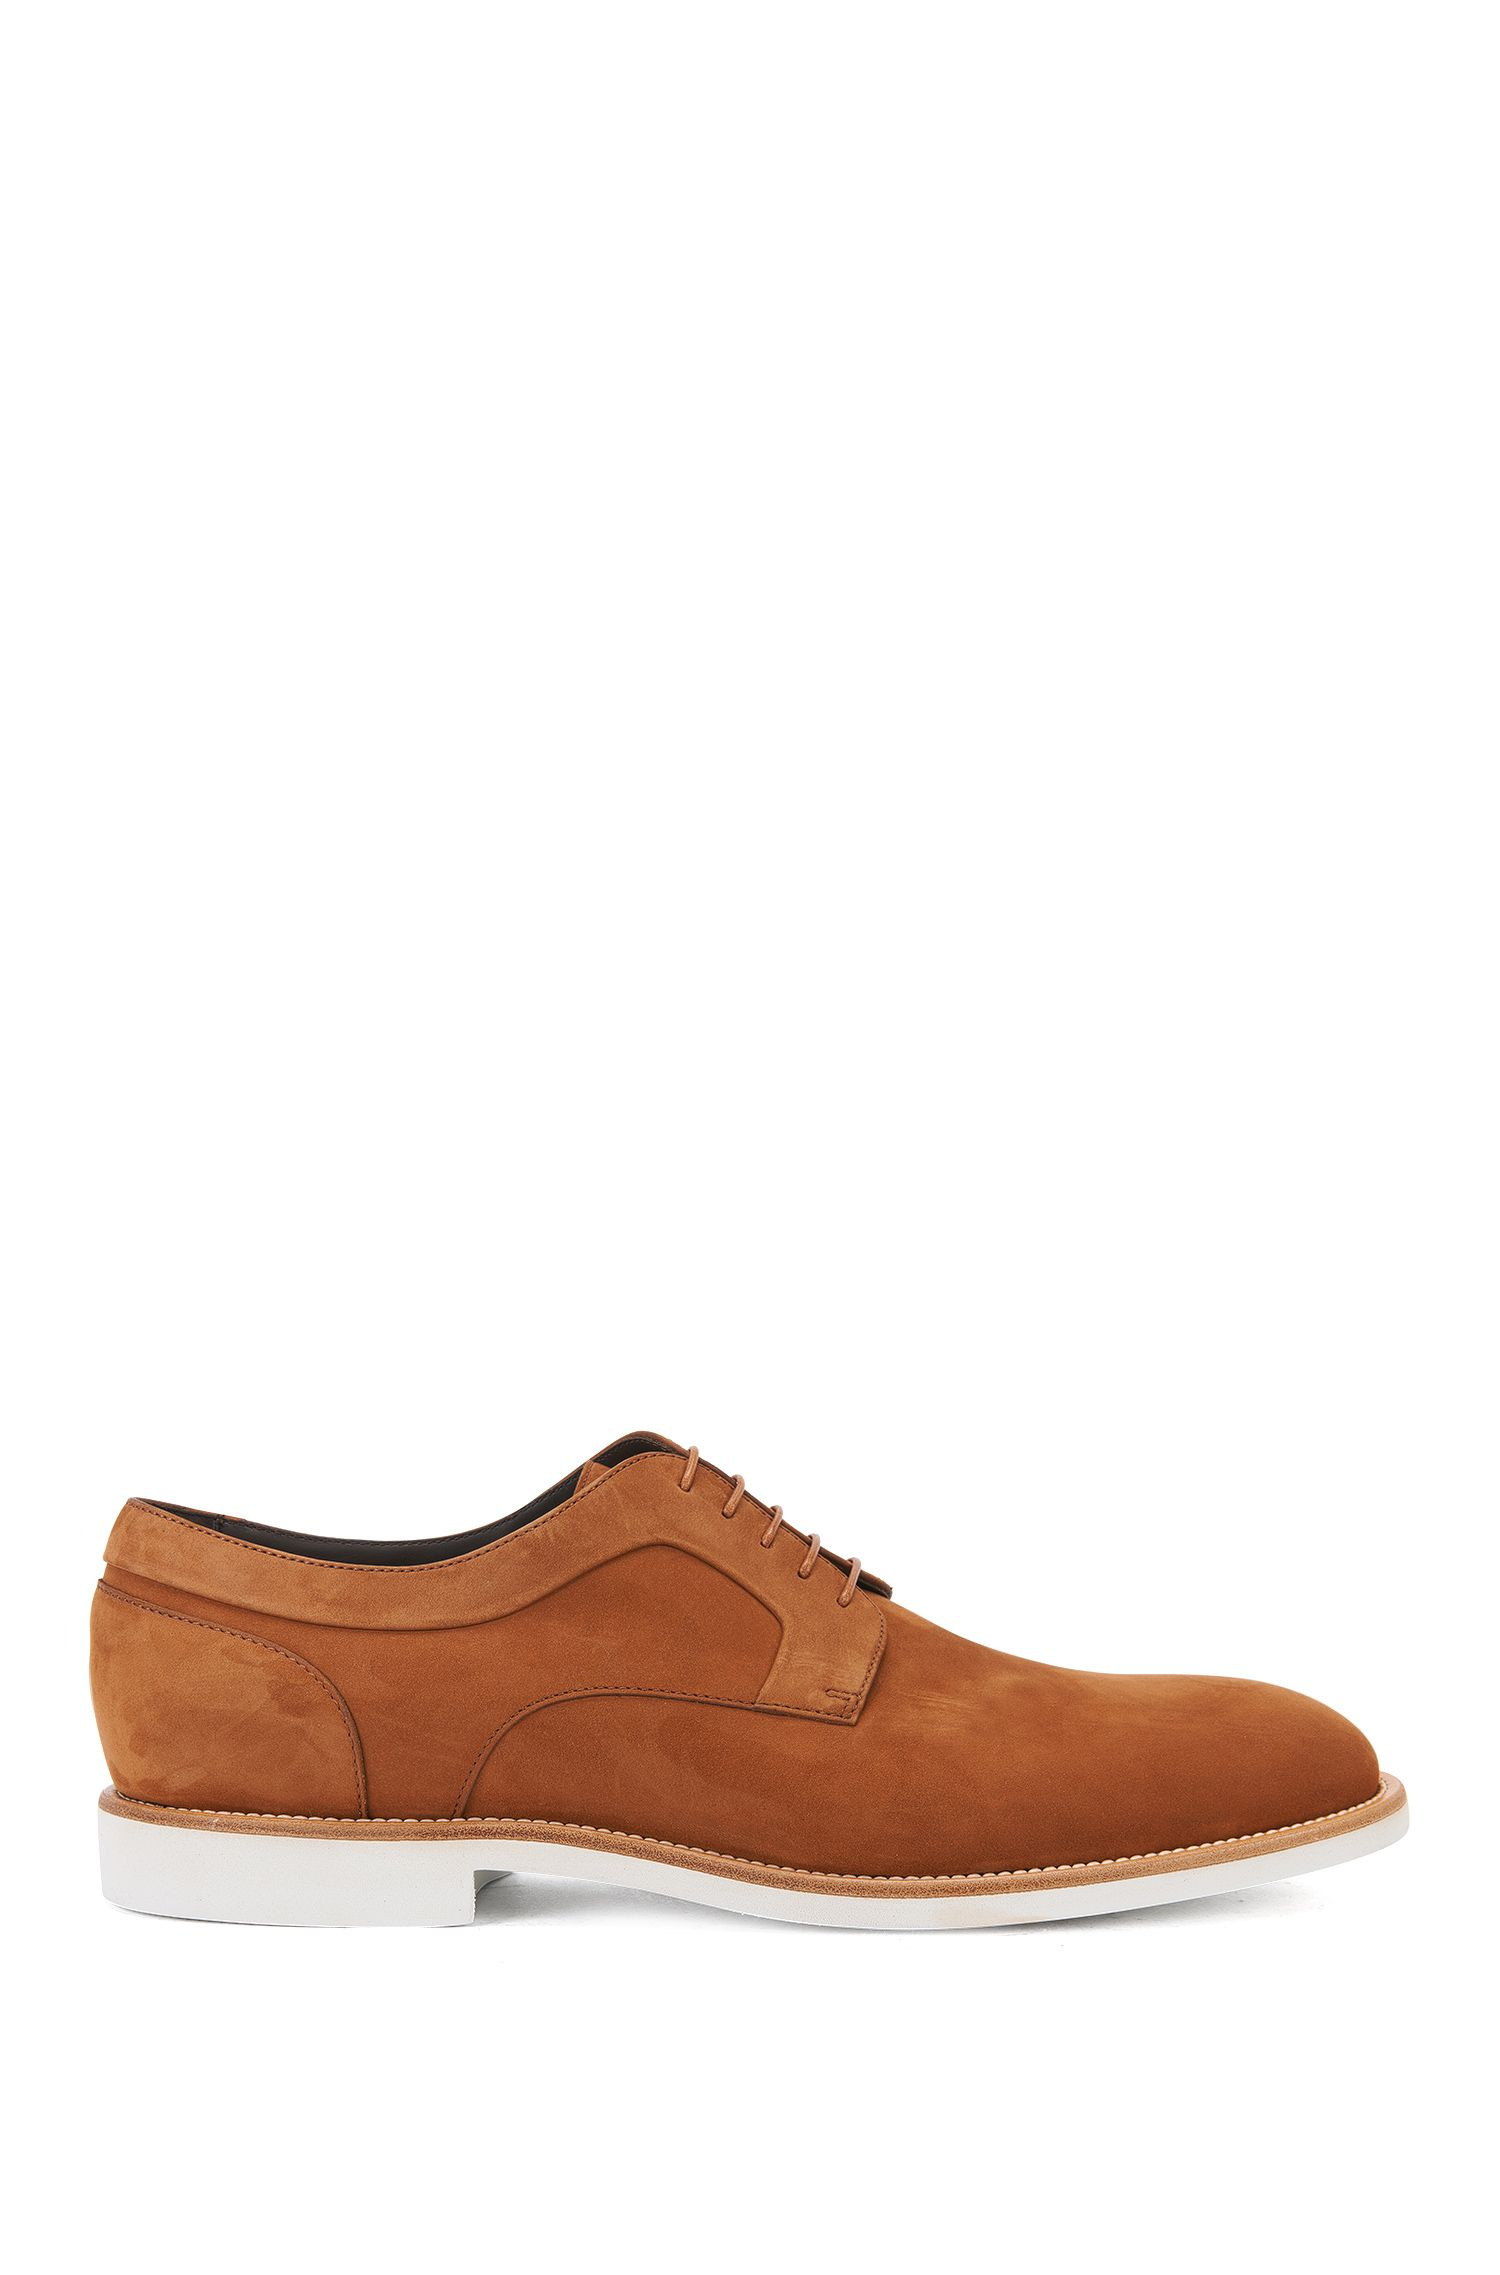 Italian Nubuck Derby Shoe | Ocean Derb Nu